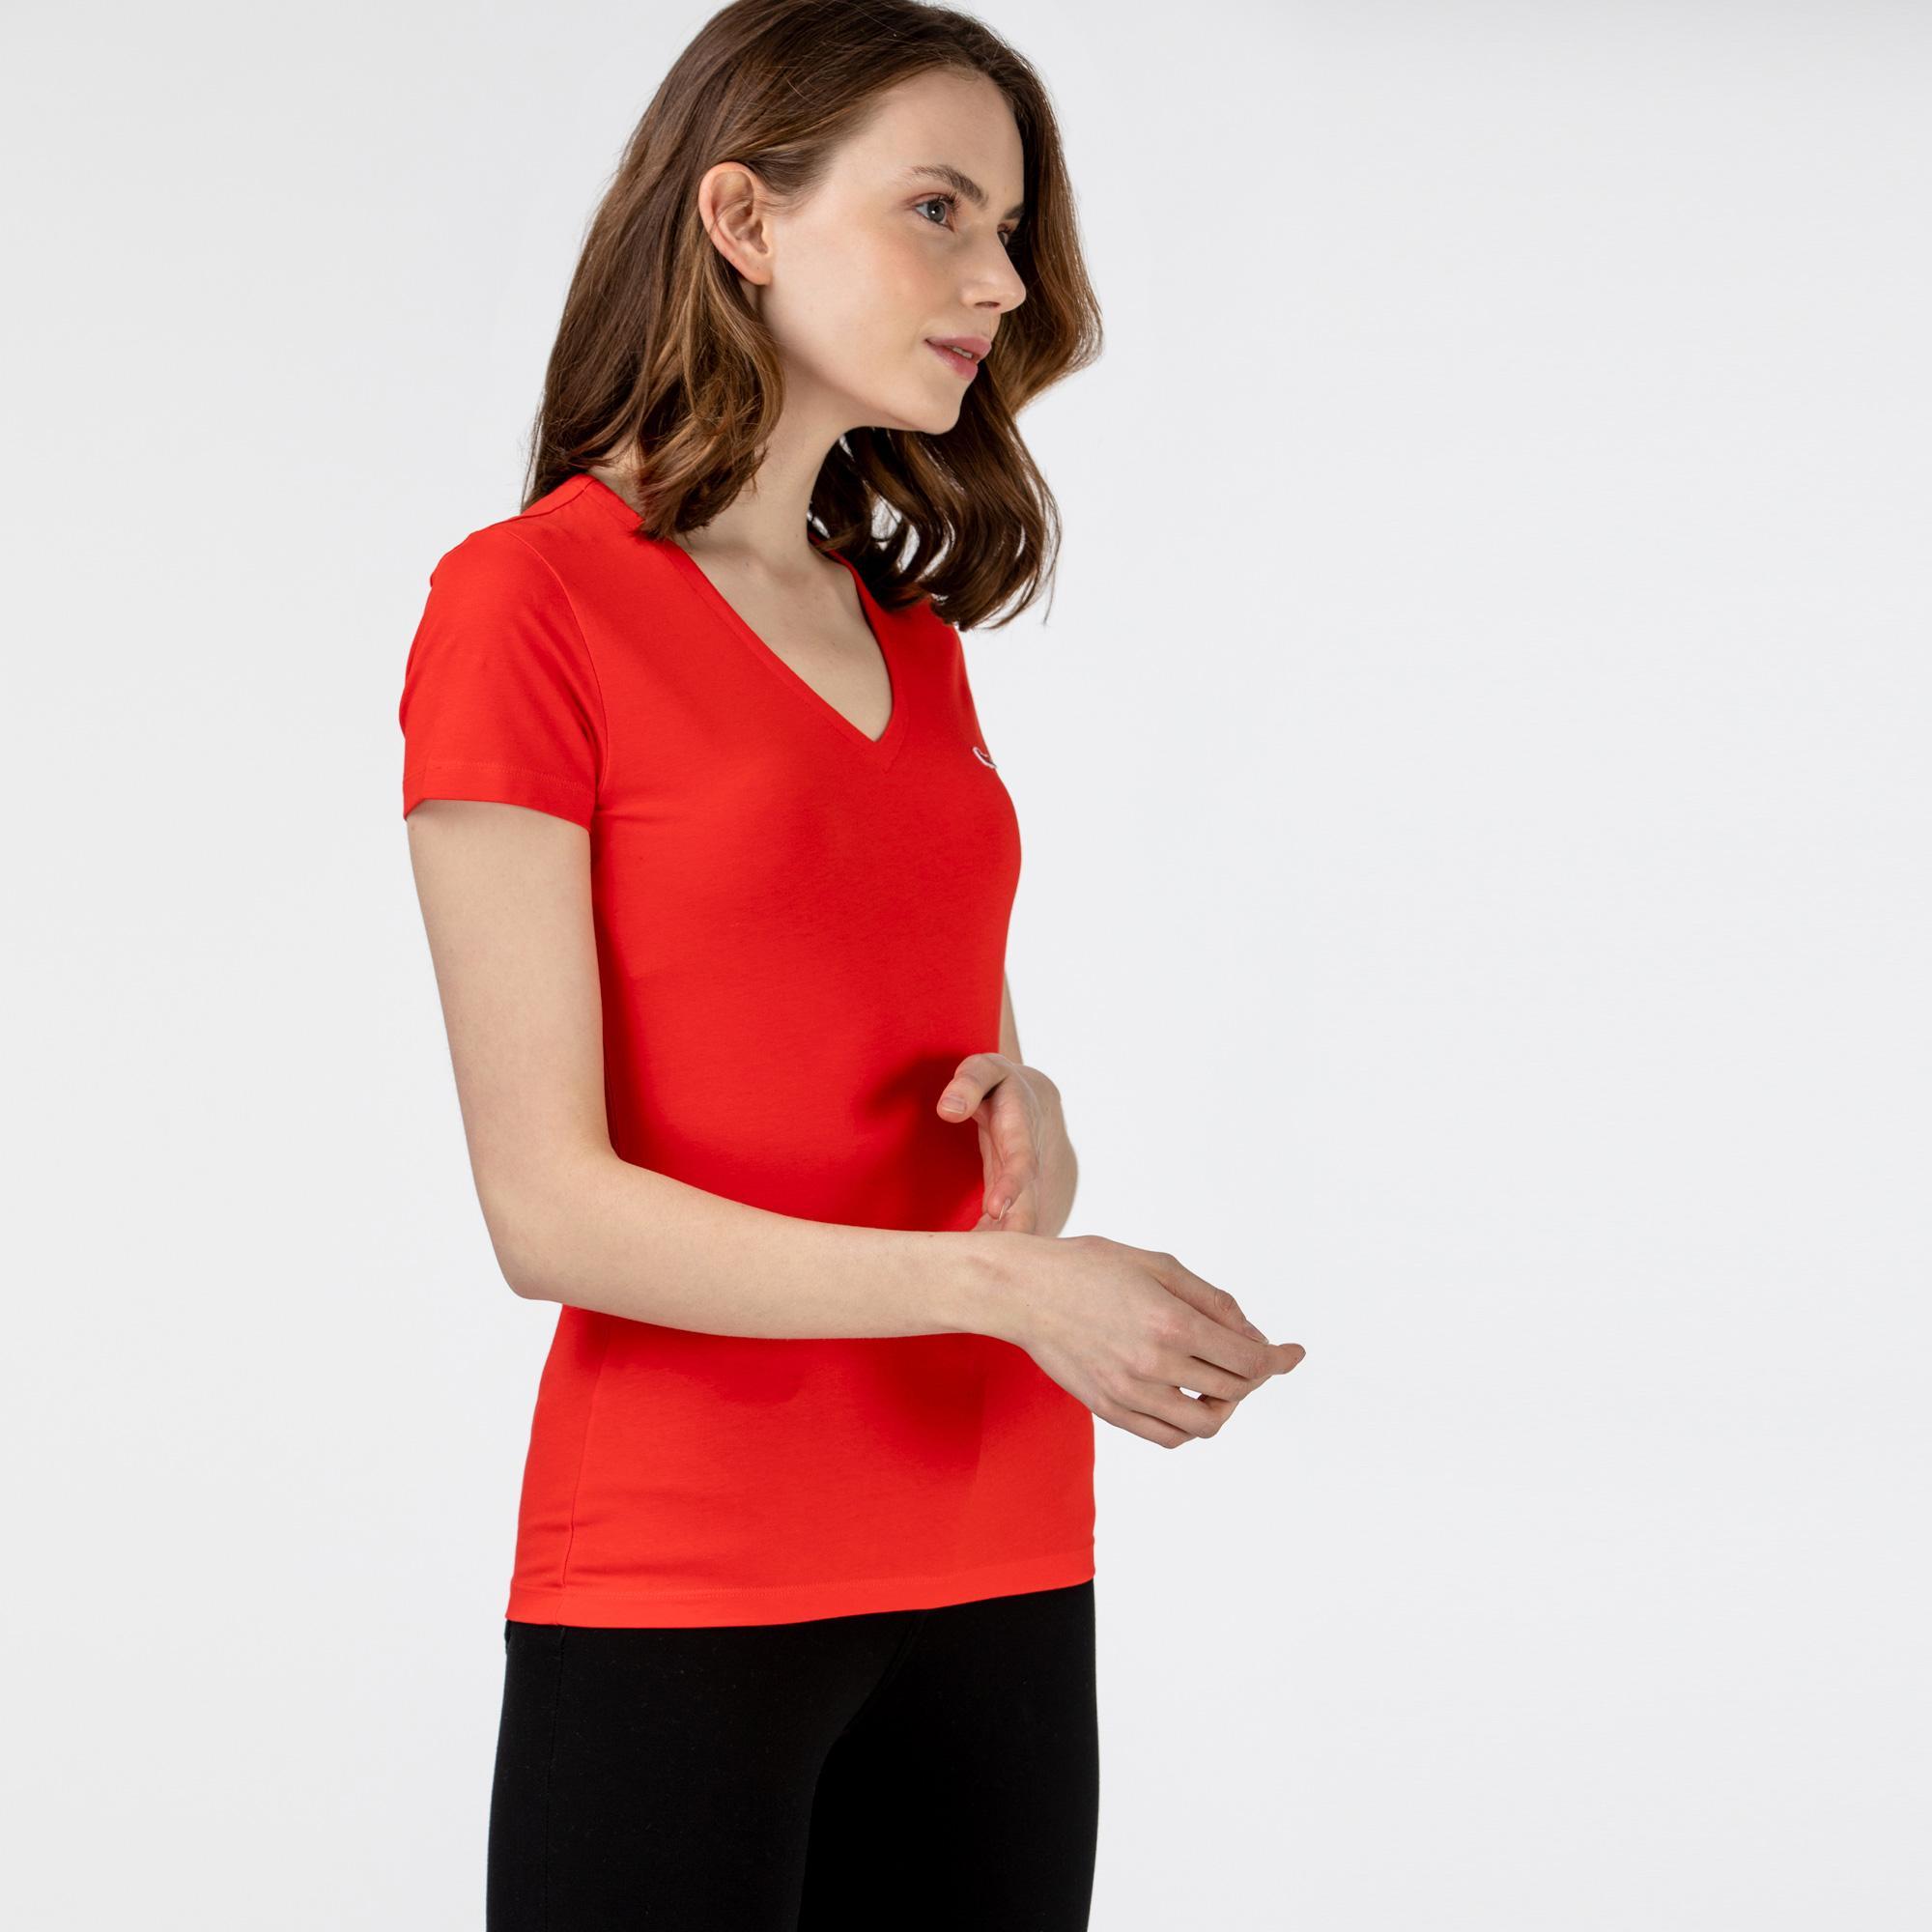 Lacoste Kadın Slim Fit V Yaka Kırmızı T-Shirt